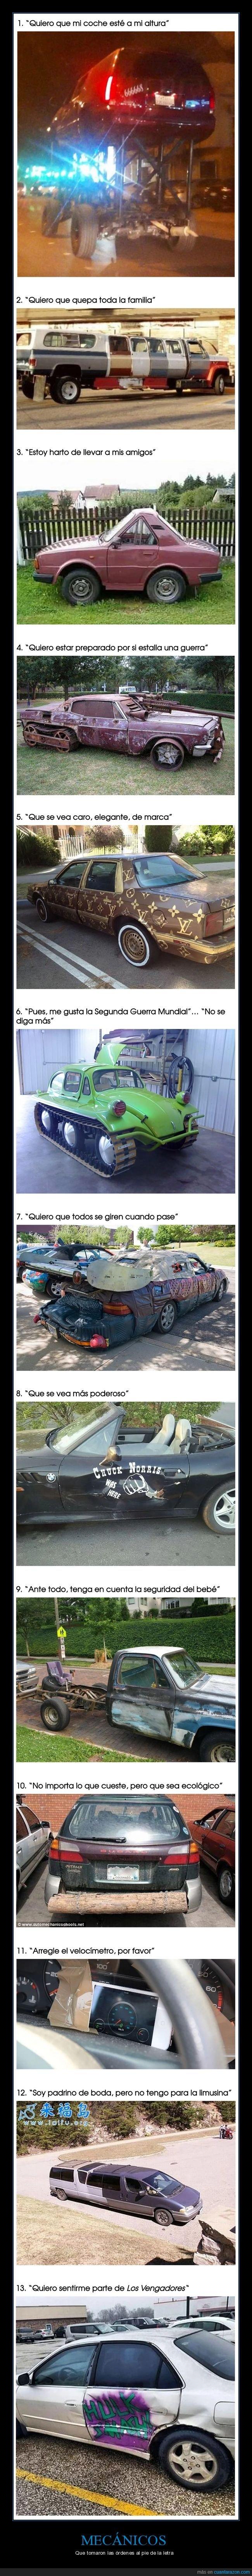 coches,fails,mecánicos,pie de la letra